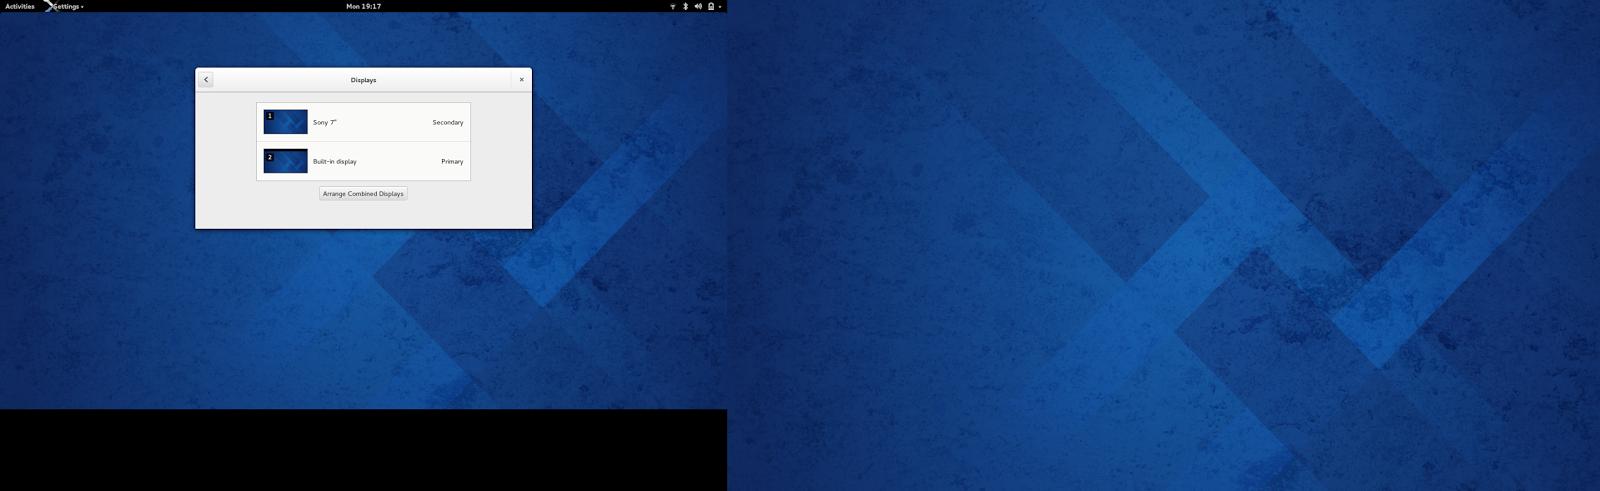 b?s 'tj?~ no 'se ??/ (hadess) | News: GNOME 3.10 is coming!